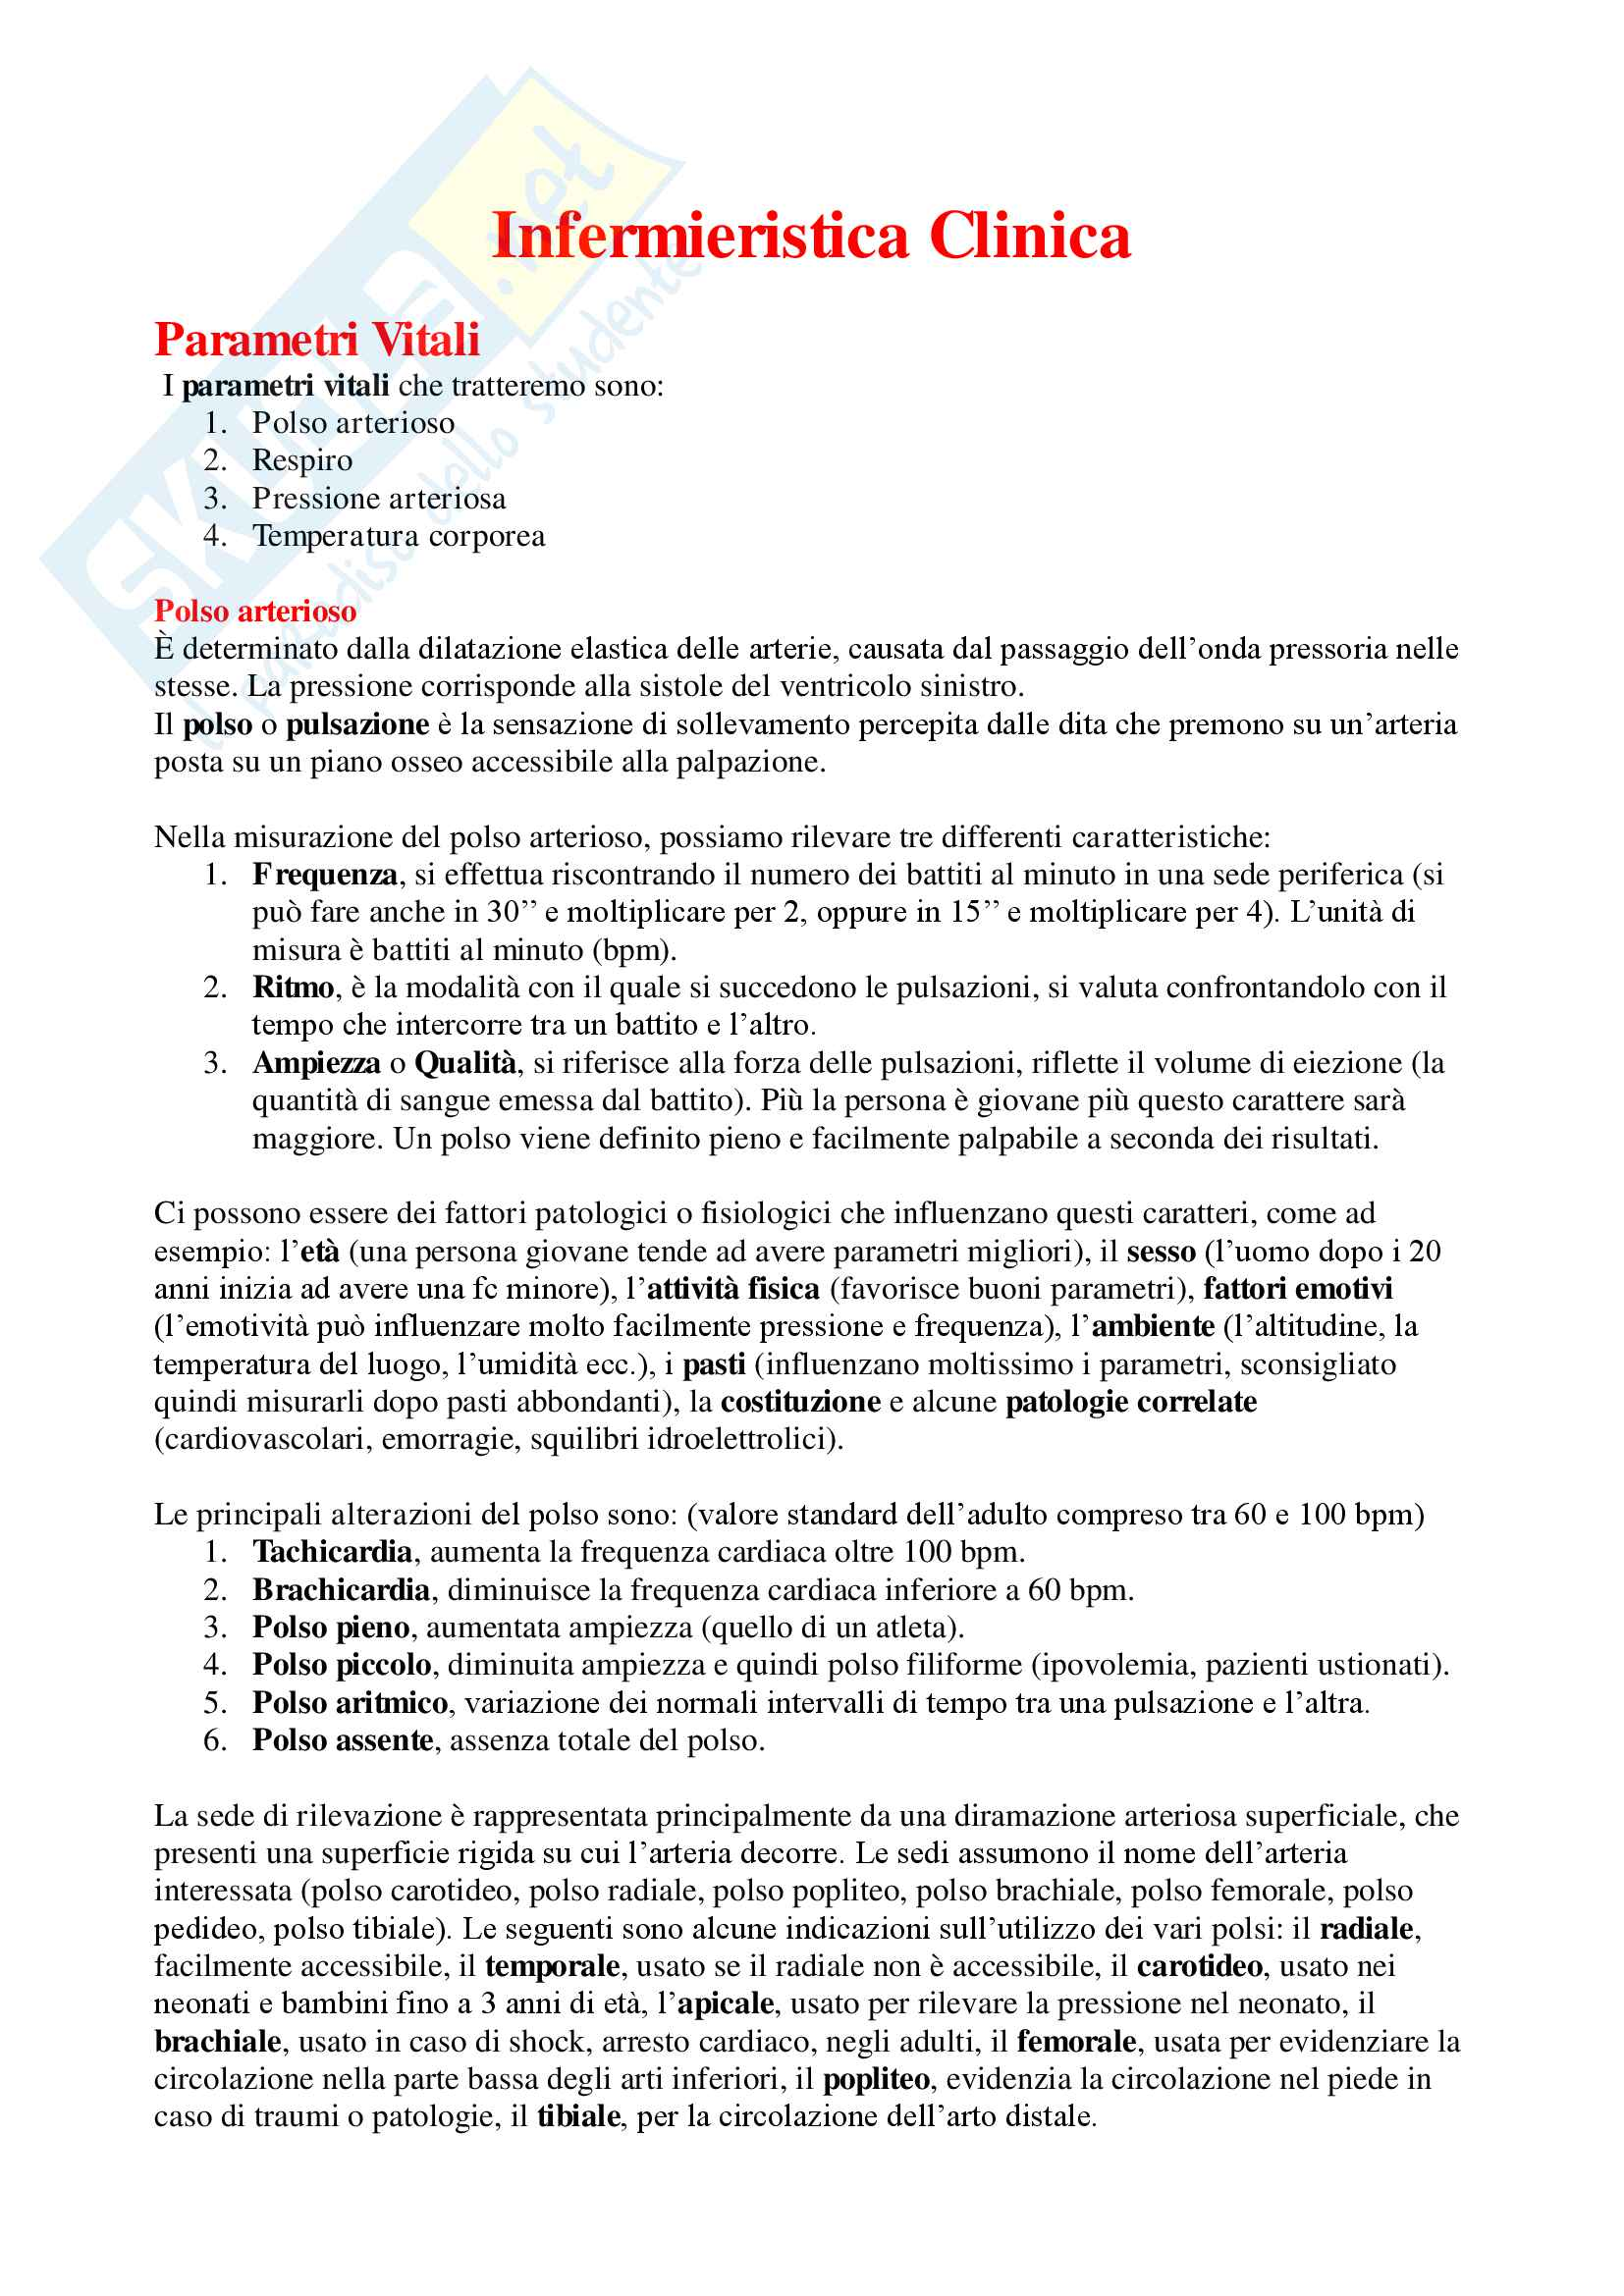 Infermieristica Clinica - Appunti Completi